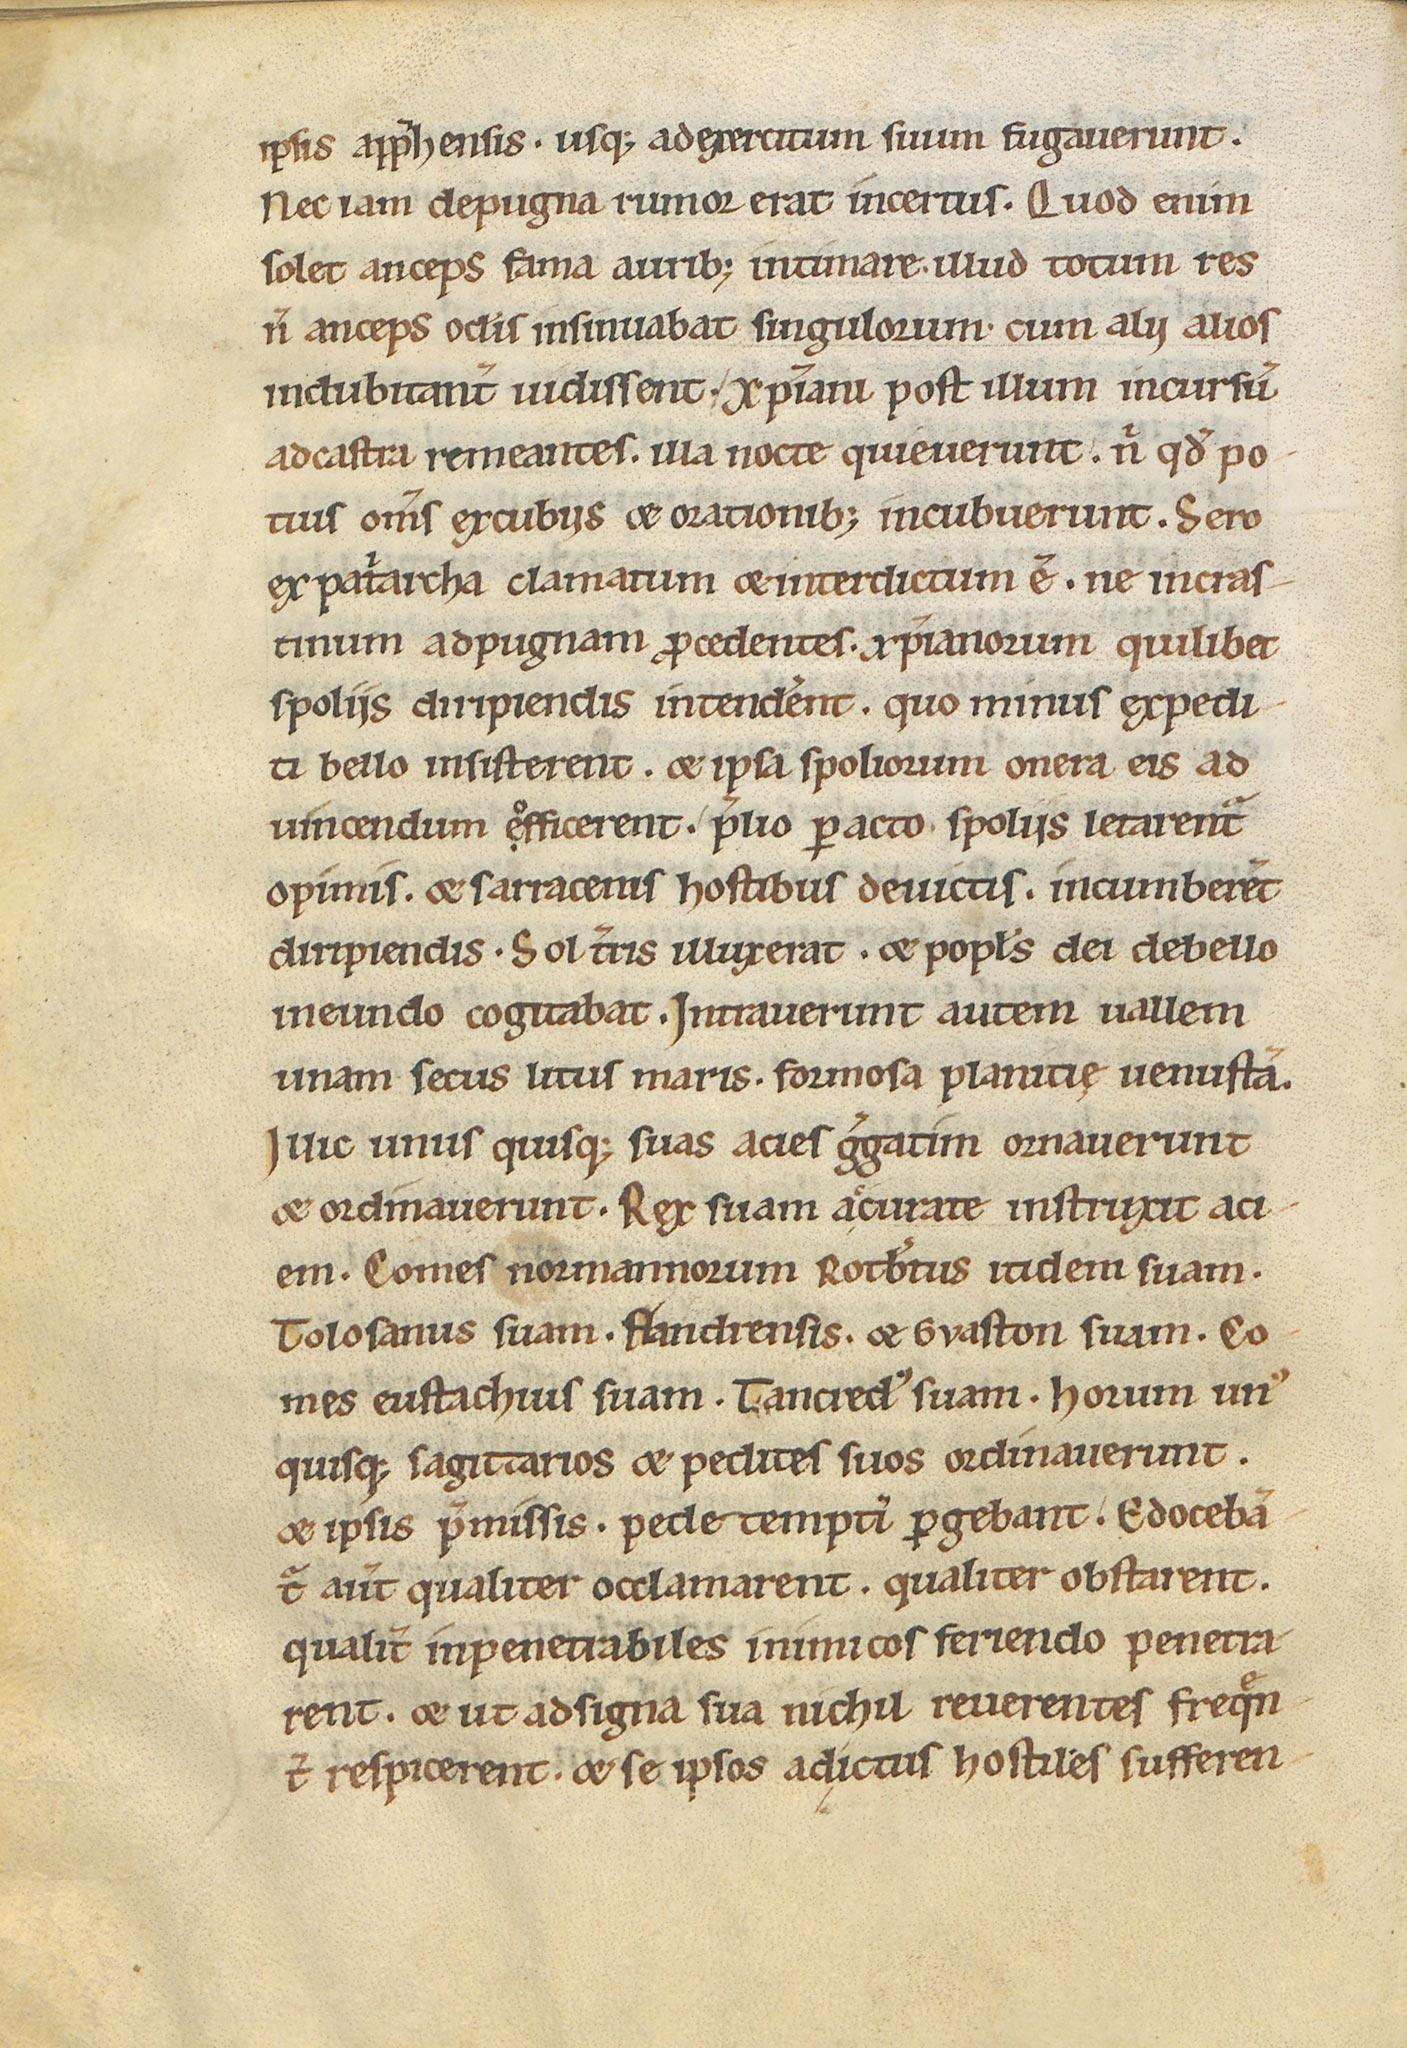 Manuscrit-Historia-Hierosolimitana-99v°